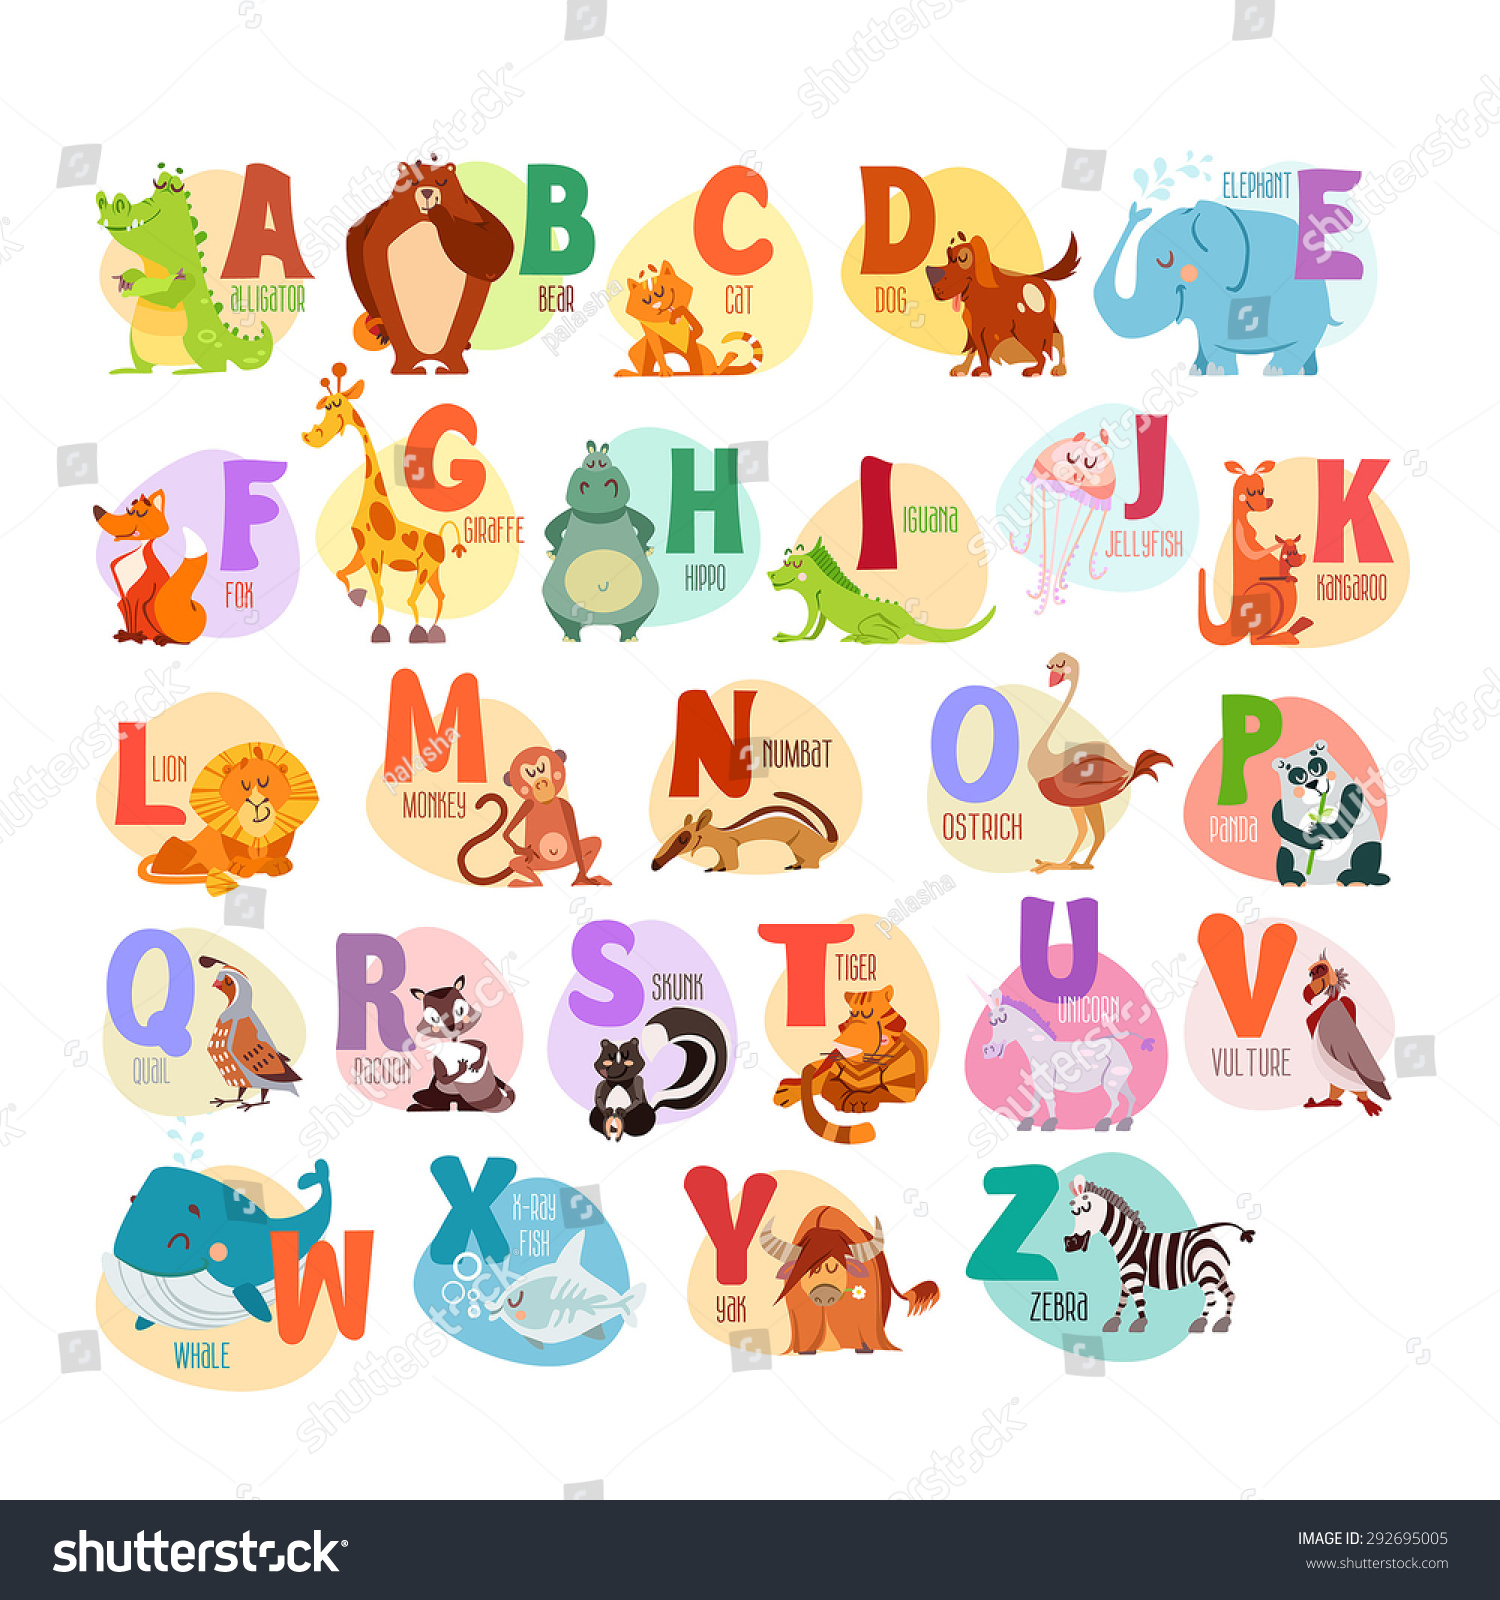 Cute Cartoon Animals Alphabet Children Education Stock Vector ...